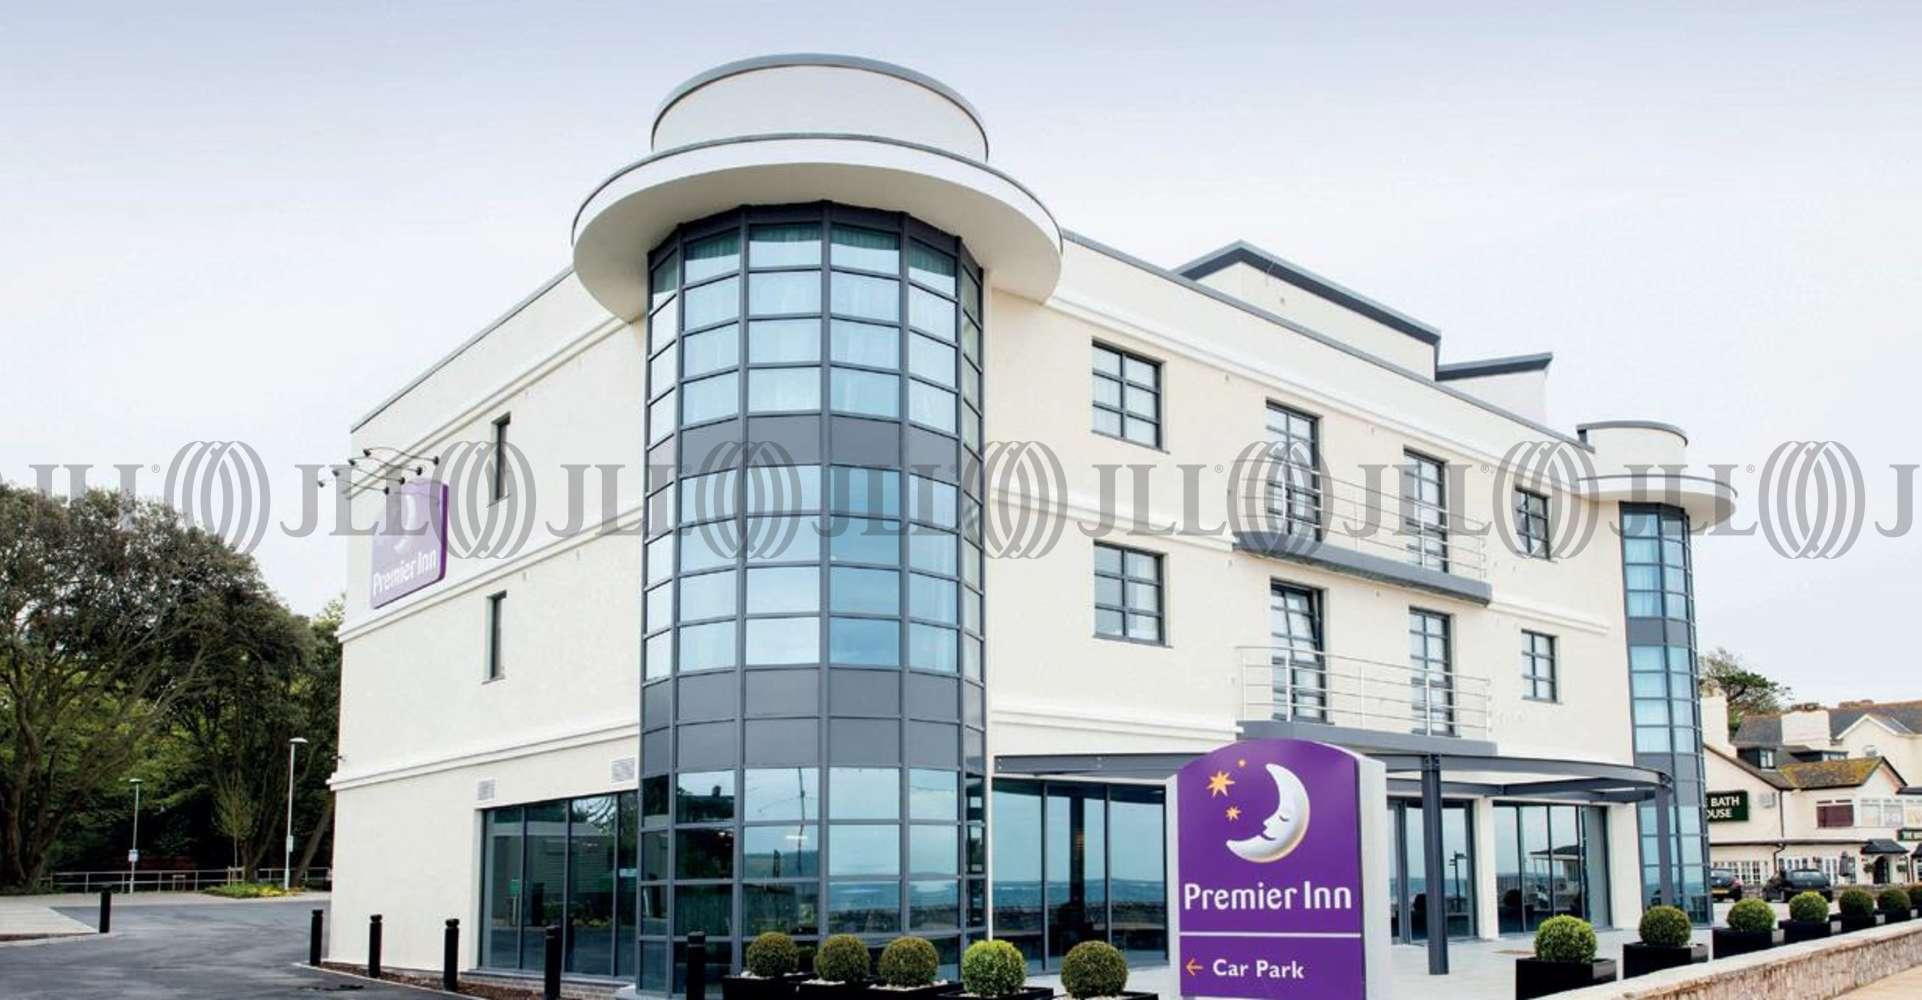 Land Exeter, EX1 1UG - Premier Inn Prospects for the South West - 2